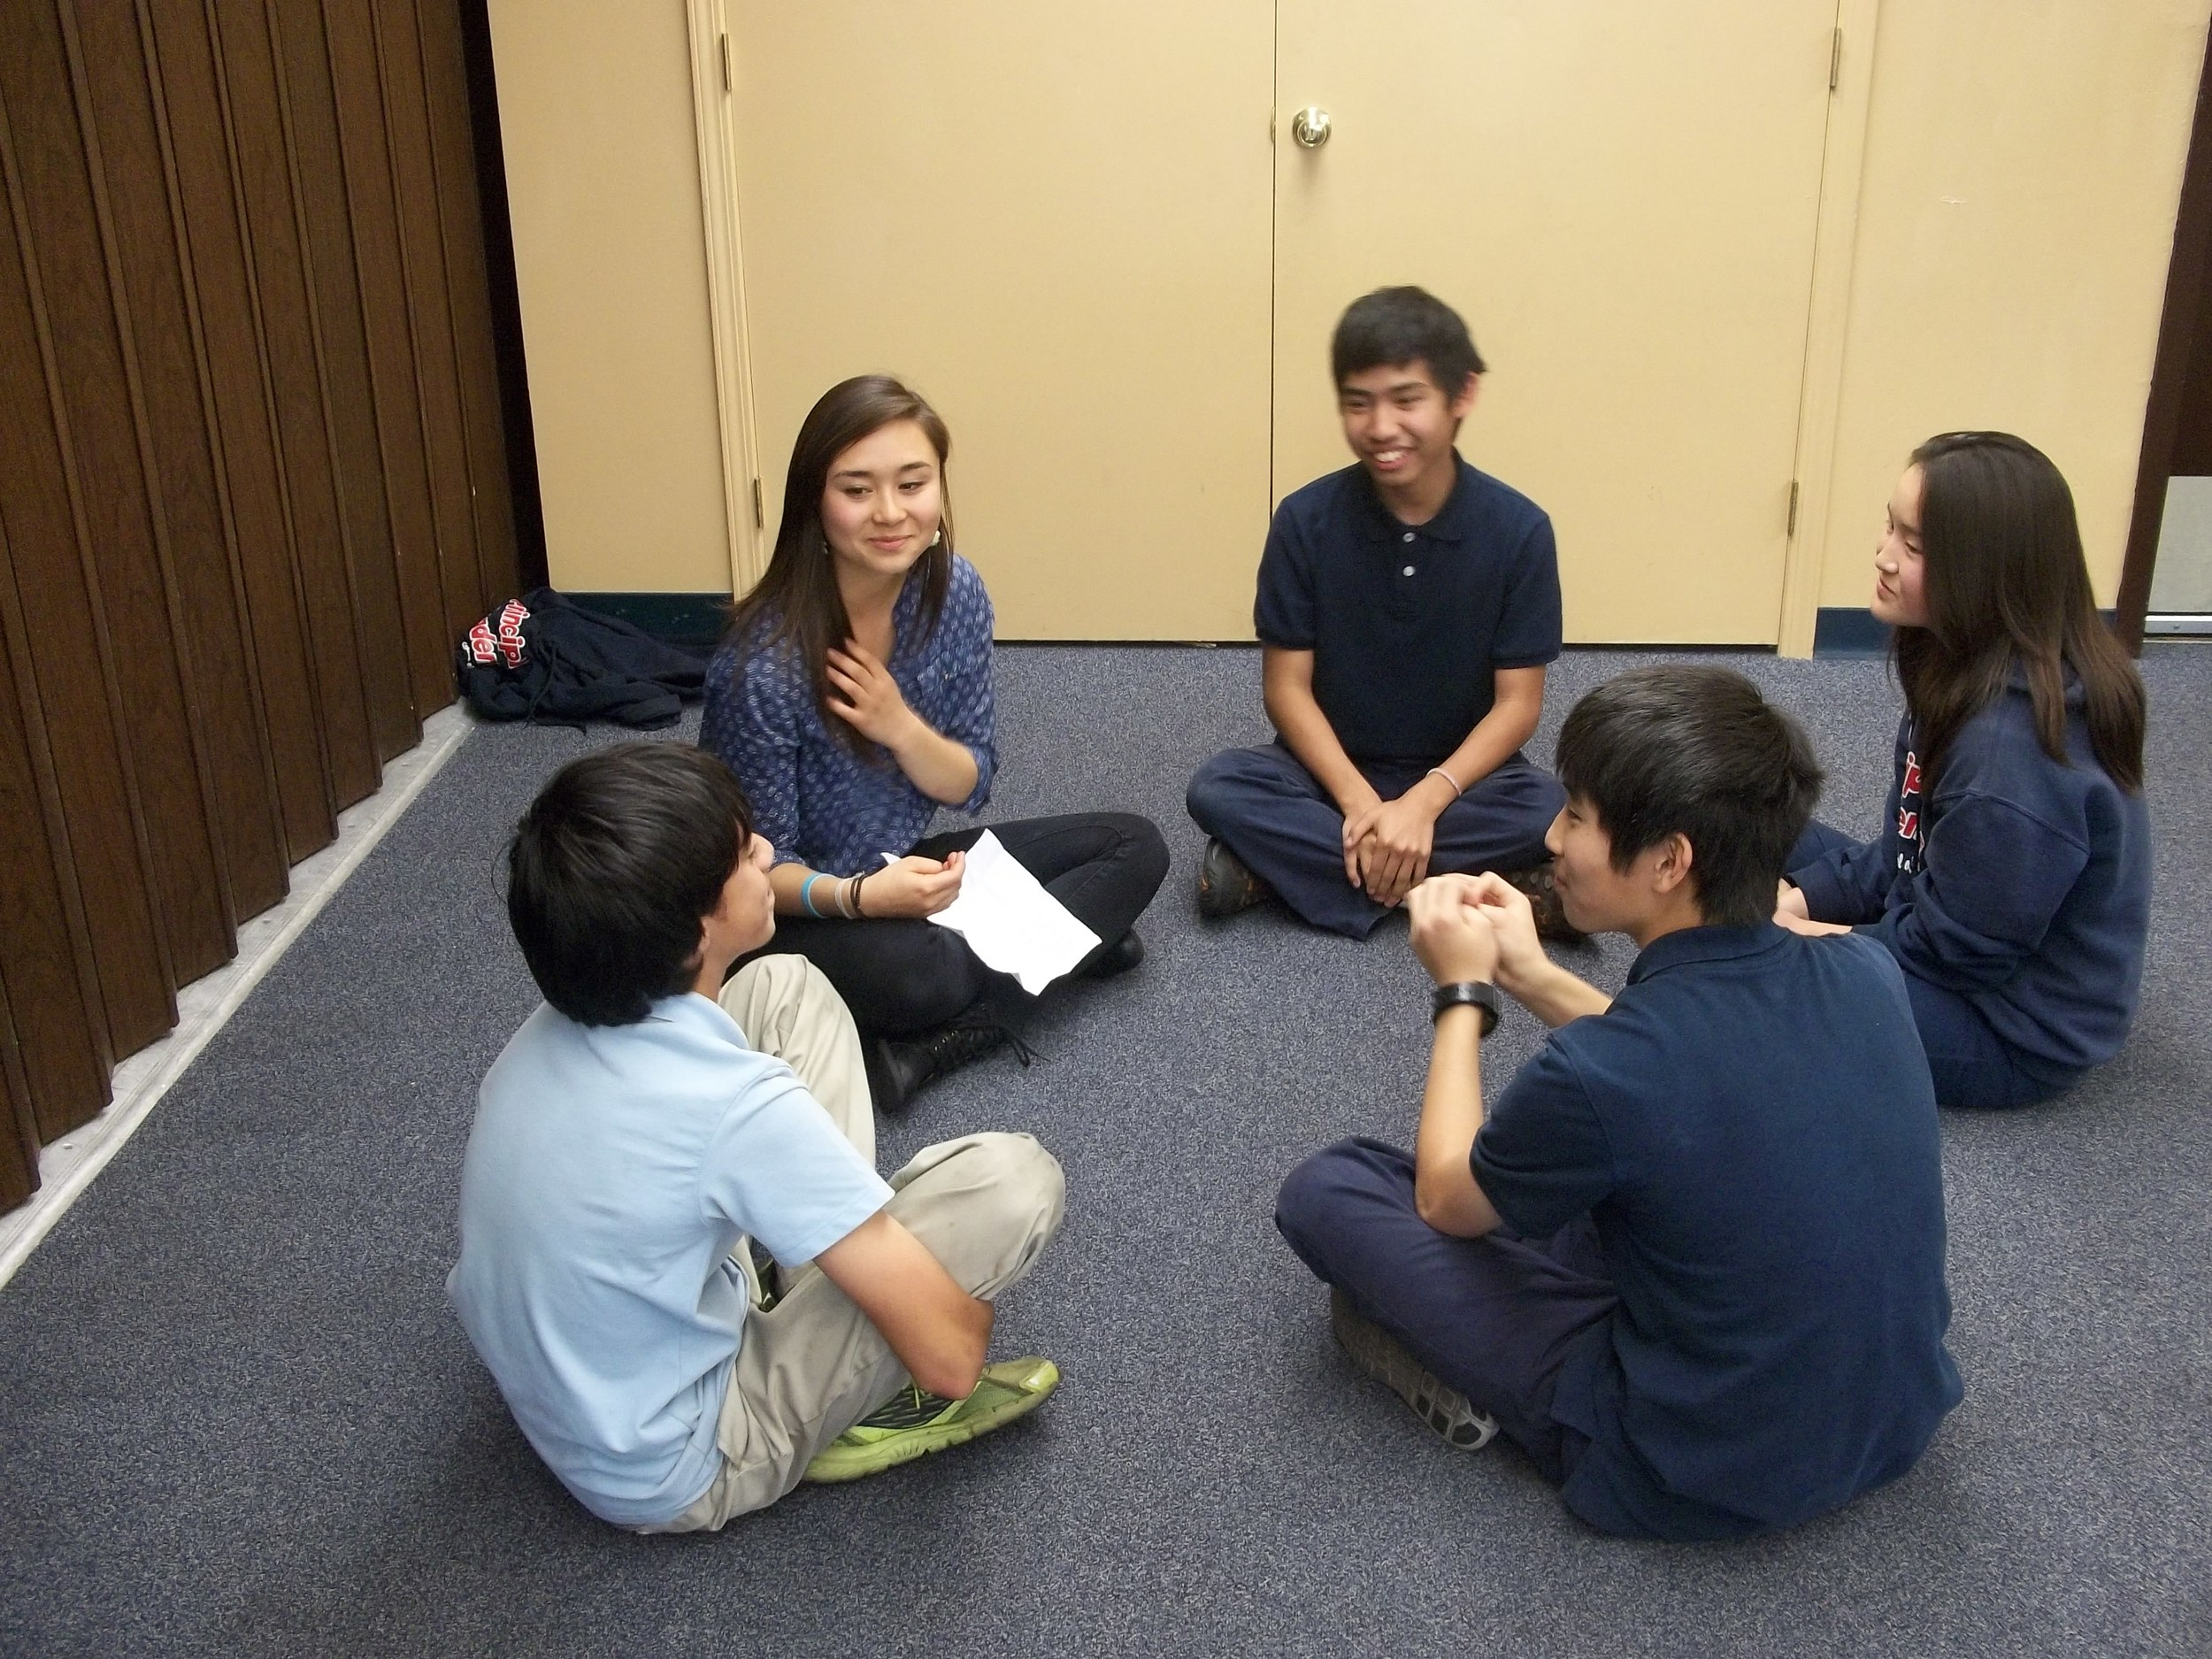 Hana leading a group talk